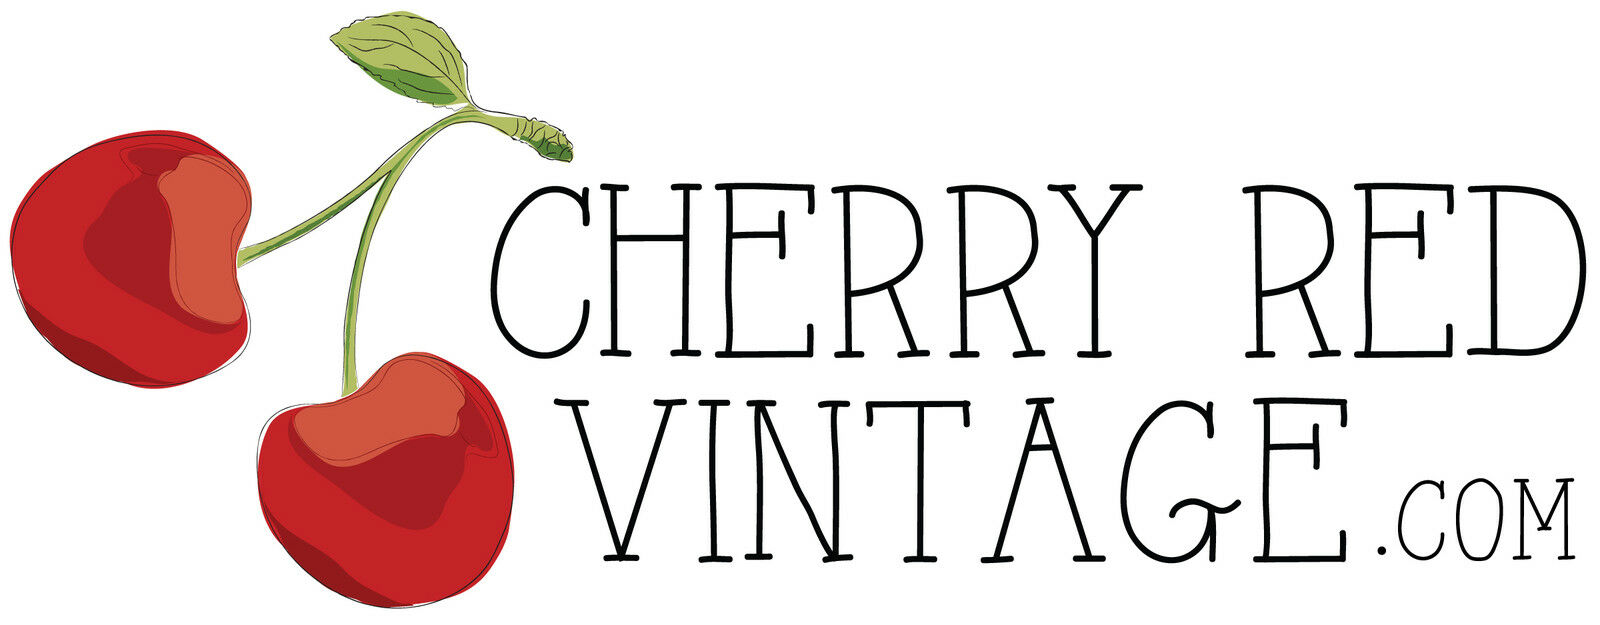 CherryRedVintage.com